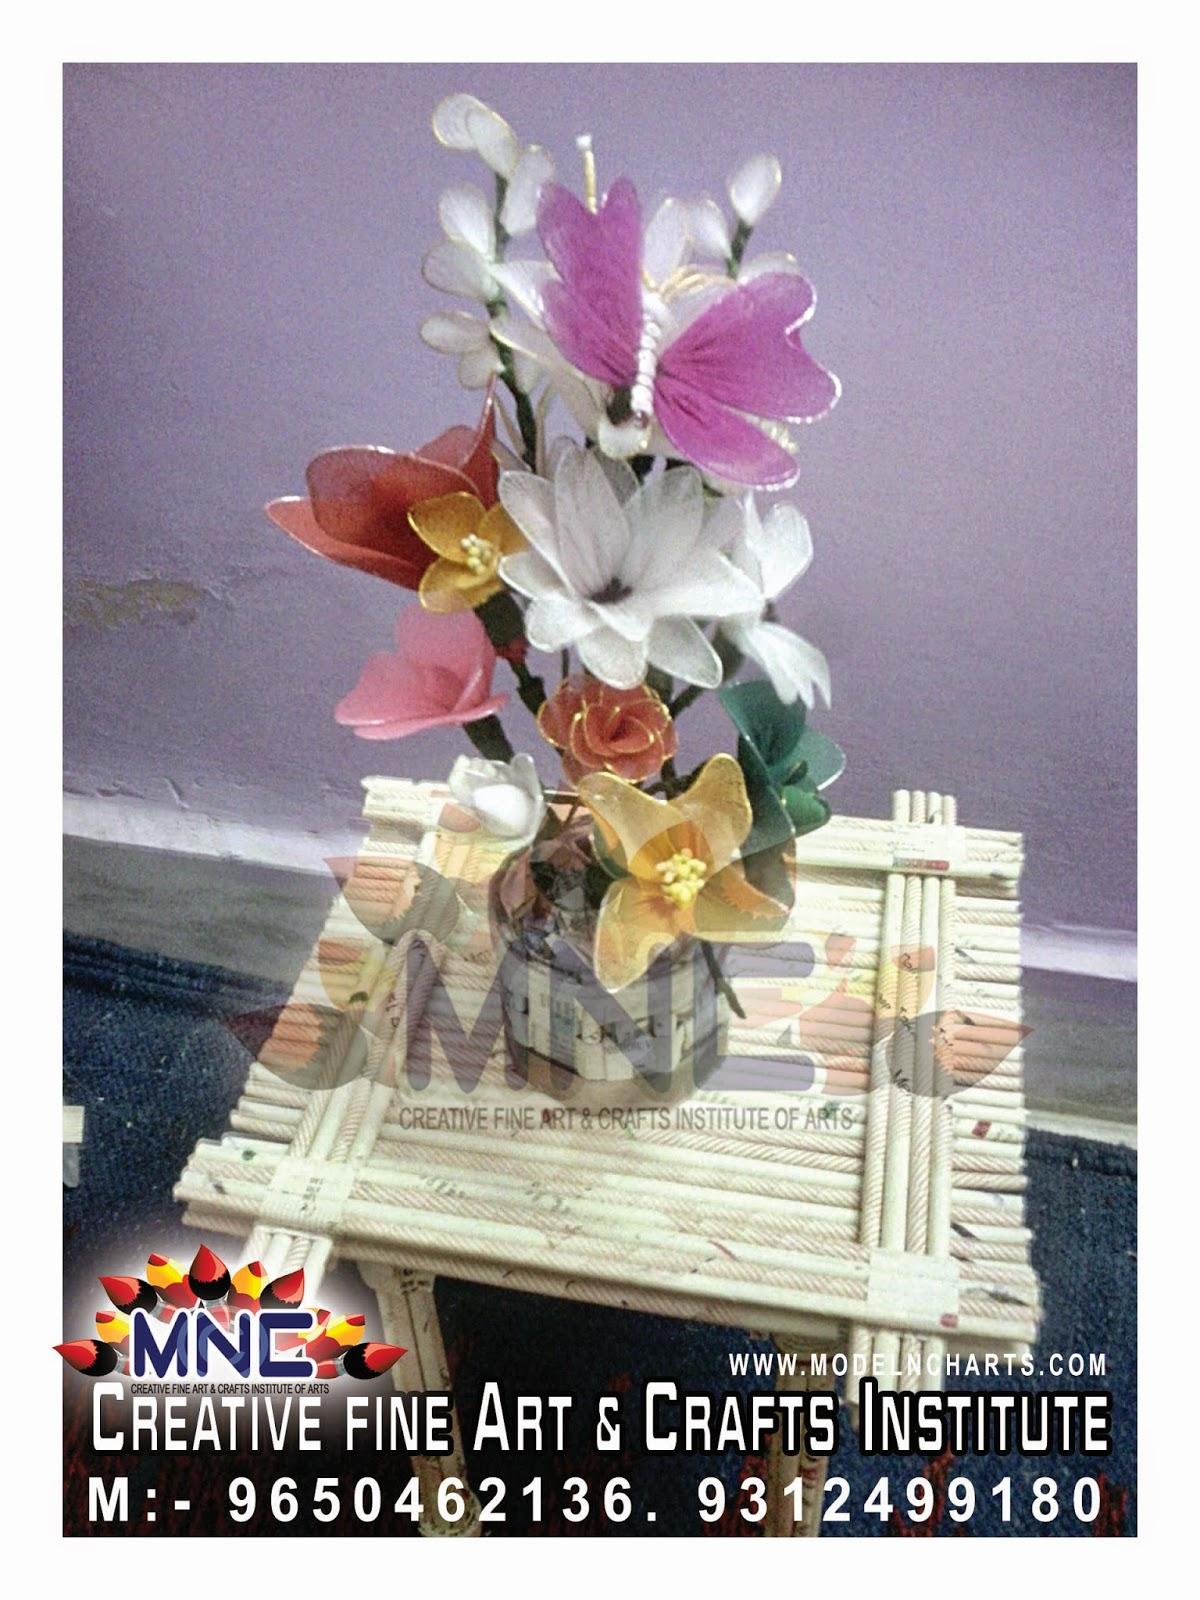 Creative fine art crafts institute 9650462136 home tutor in creative fine art crafts institute 9650462136 home tutor in delhi ncr gurgaon noida best paper crafts courses paper craft institute in delhi ncr jeuxipadfo Choice Image